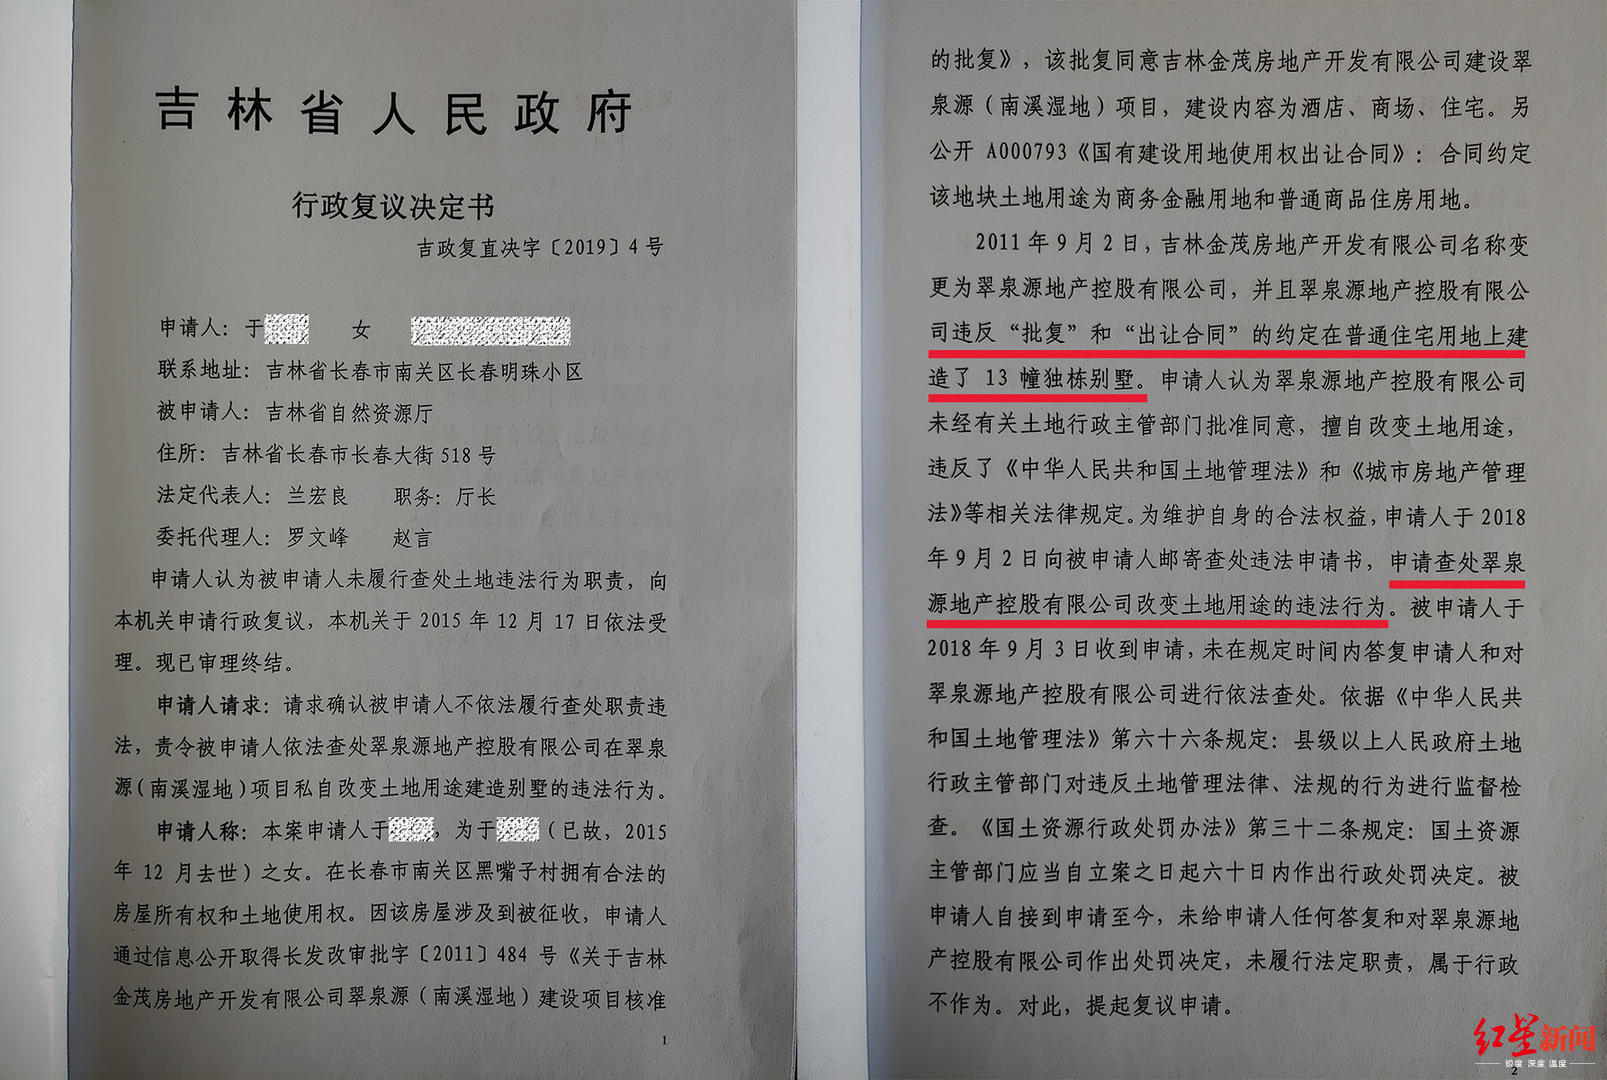 manbetx取现到账时间,受修路影响 潍坊37路公交局部走向临时调整